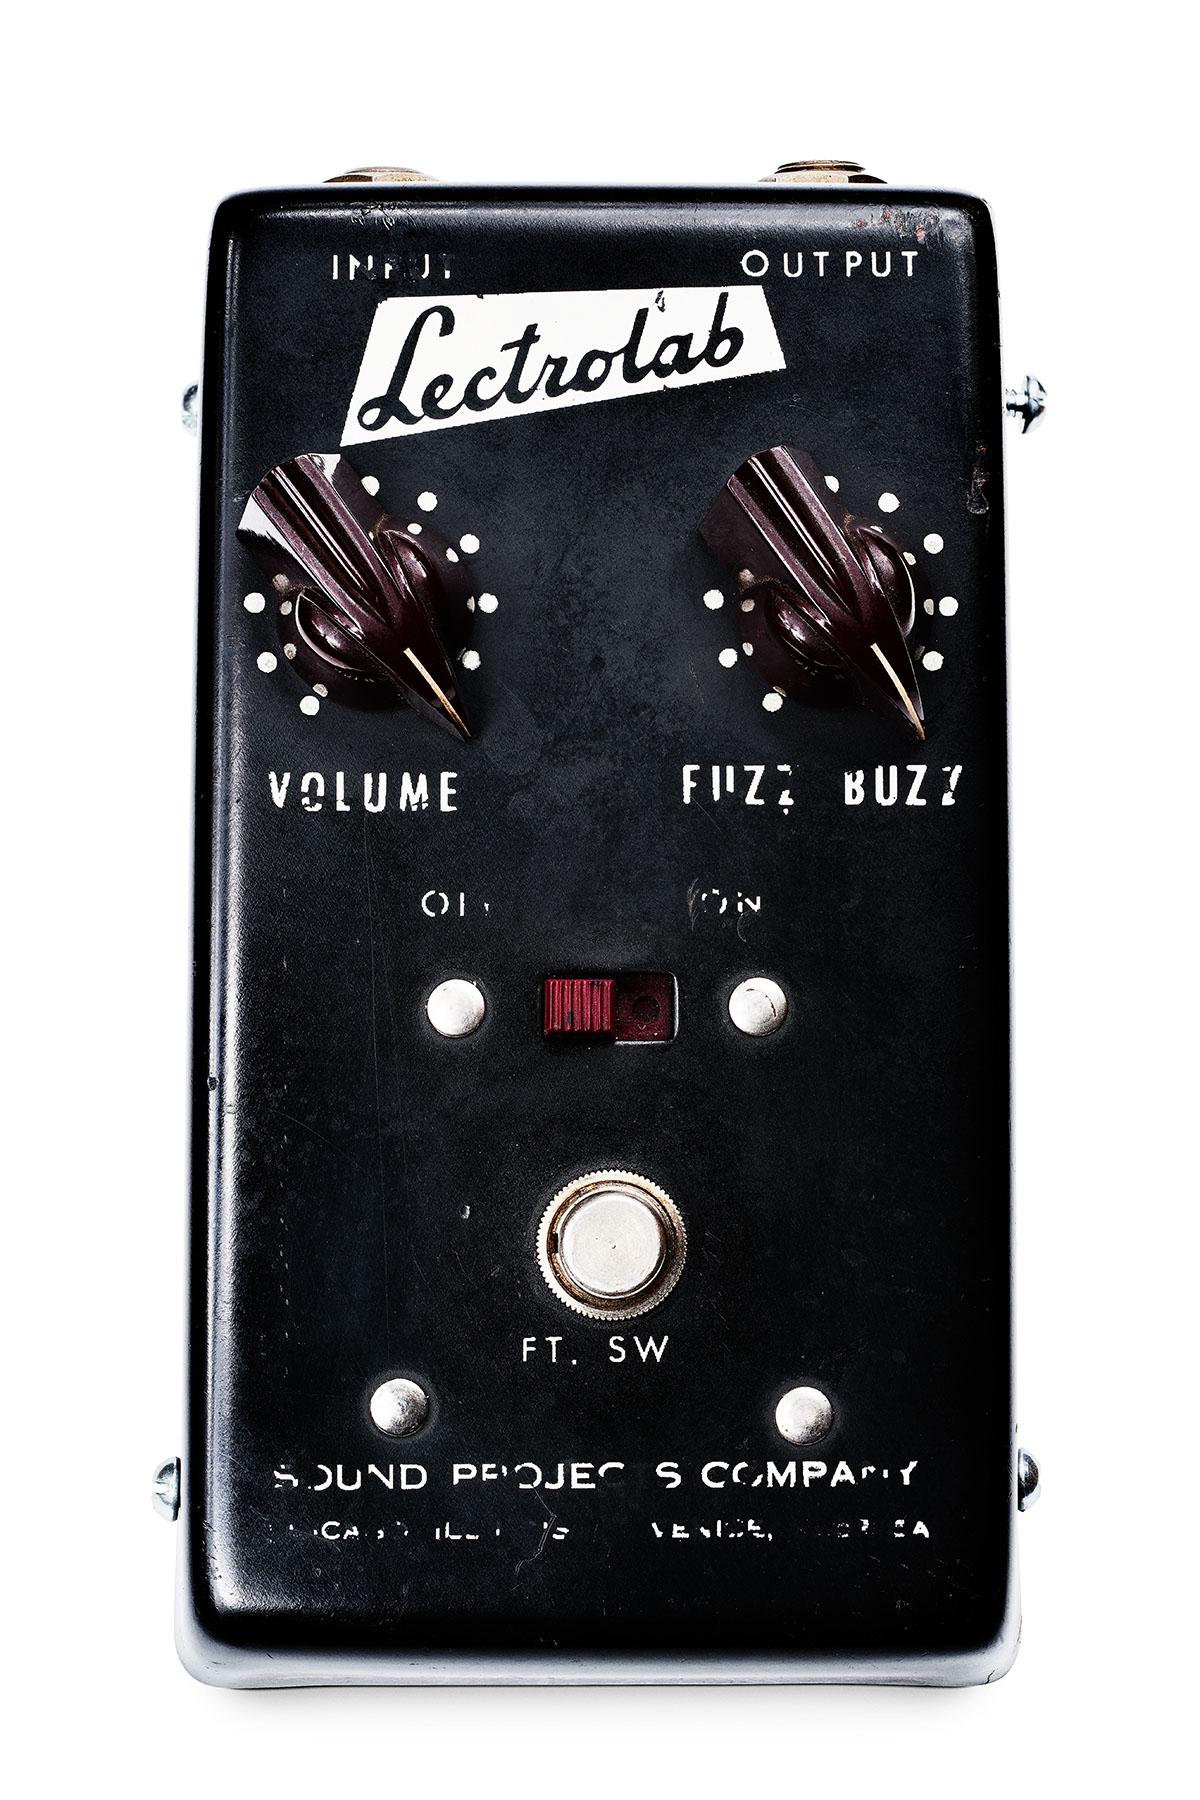 Sound Projects Company Lectrolab Fuzz Buzz